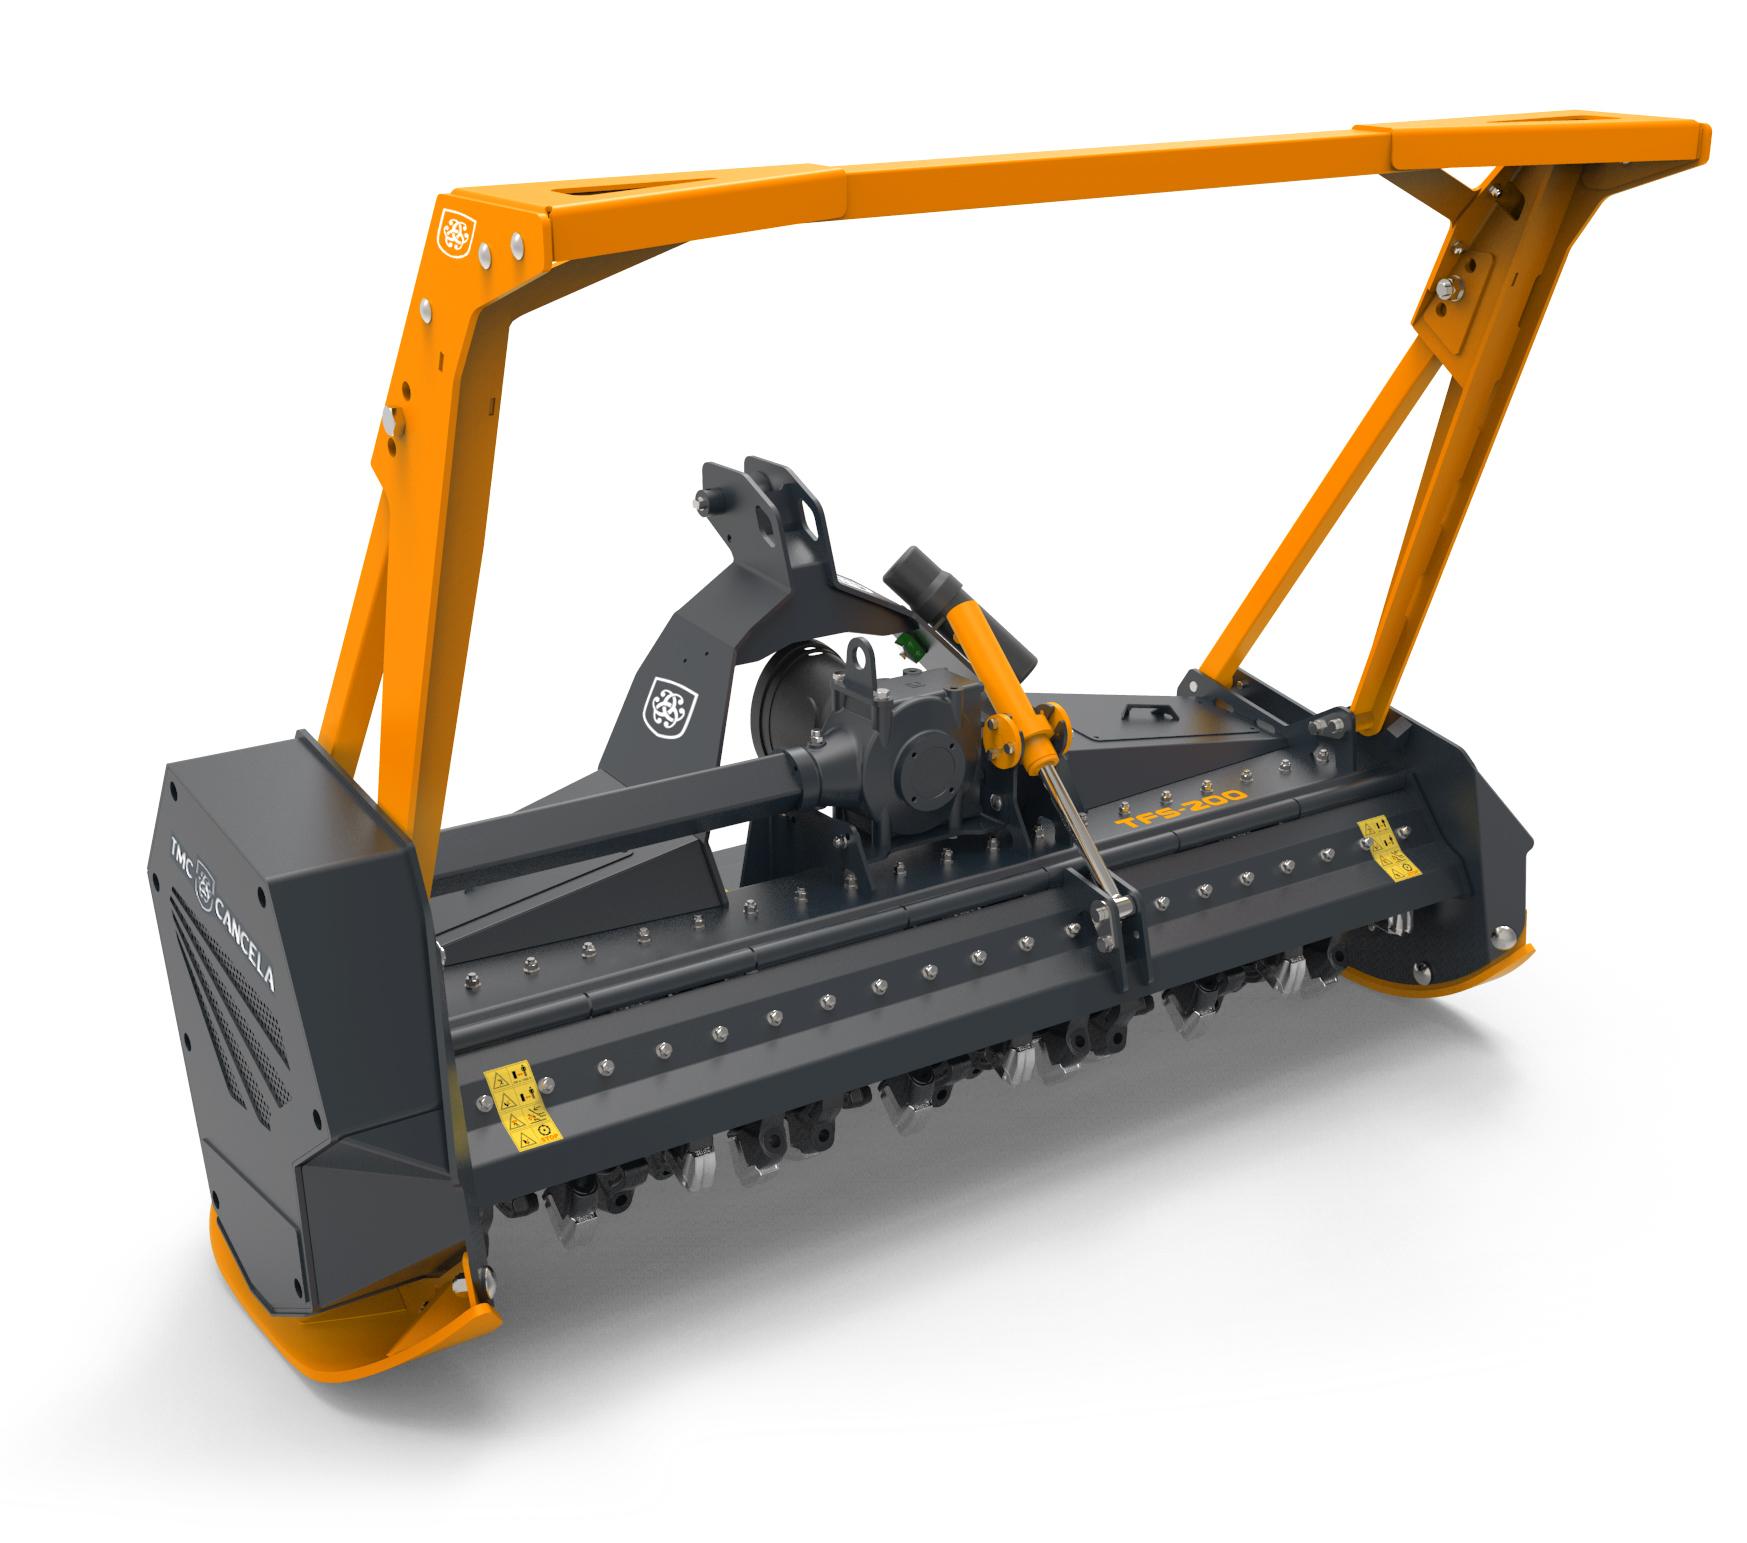 TFS 2 Trinciatrice Trincia Trituradora Triturador Forestal Foresta Forestale